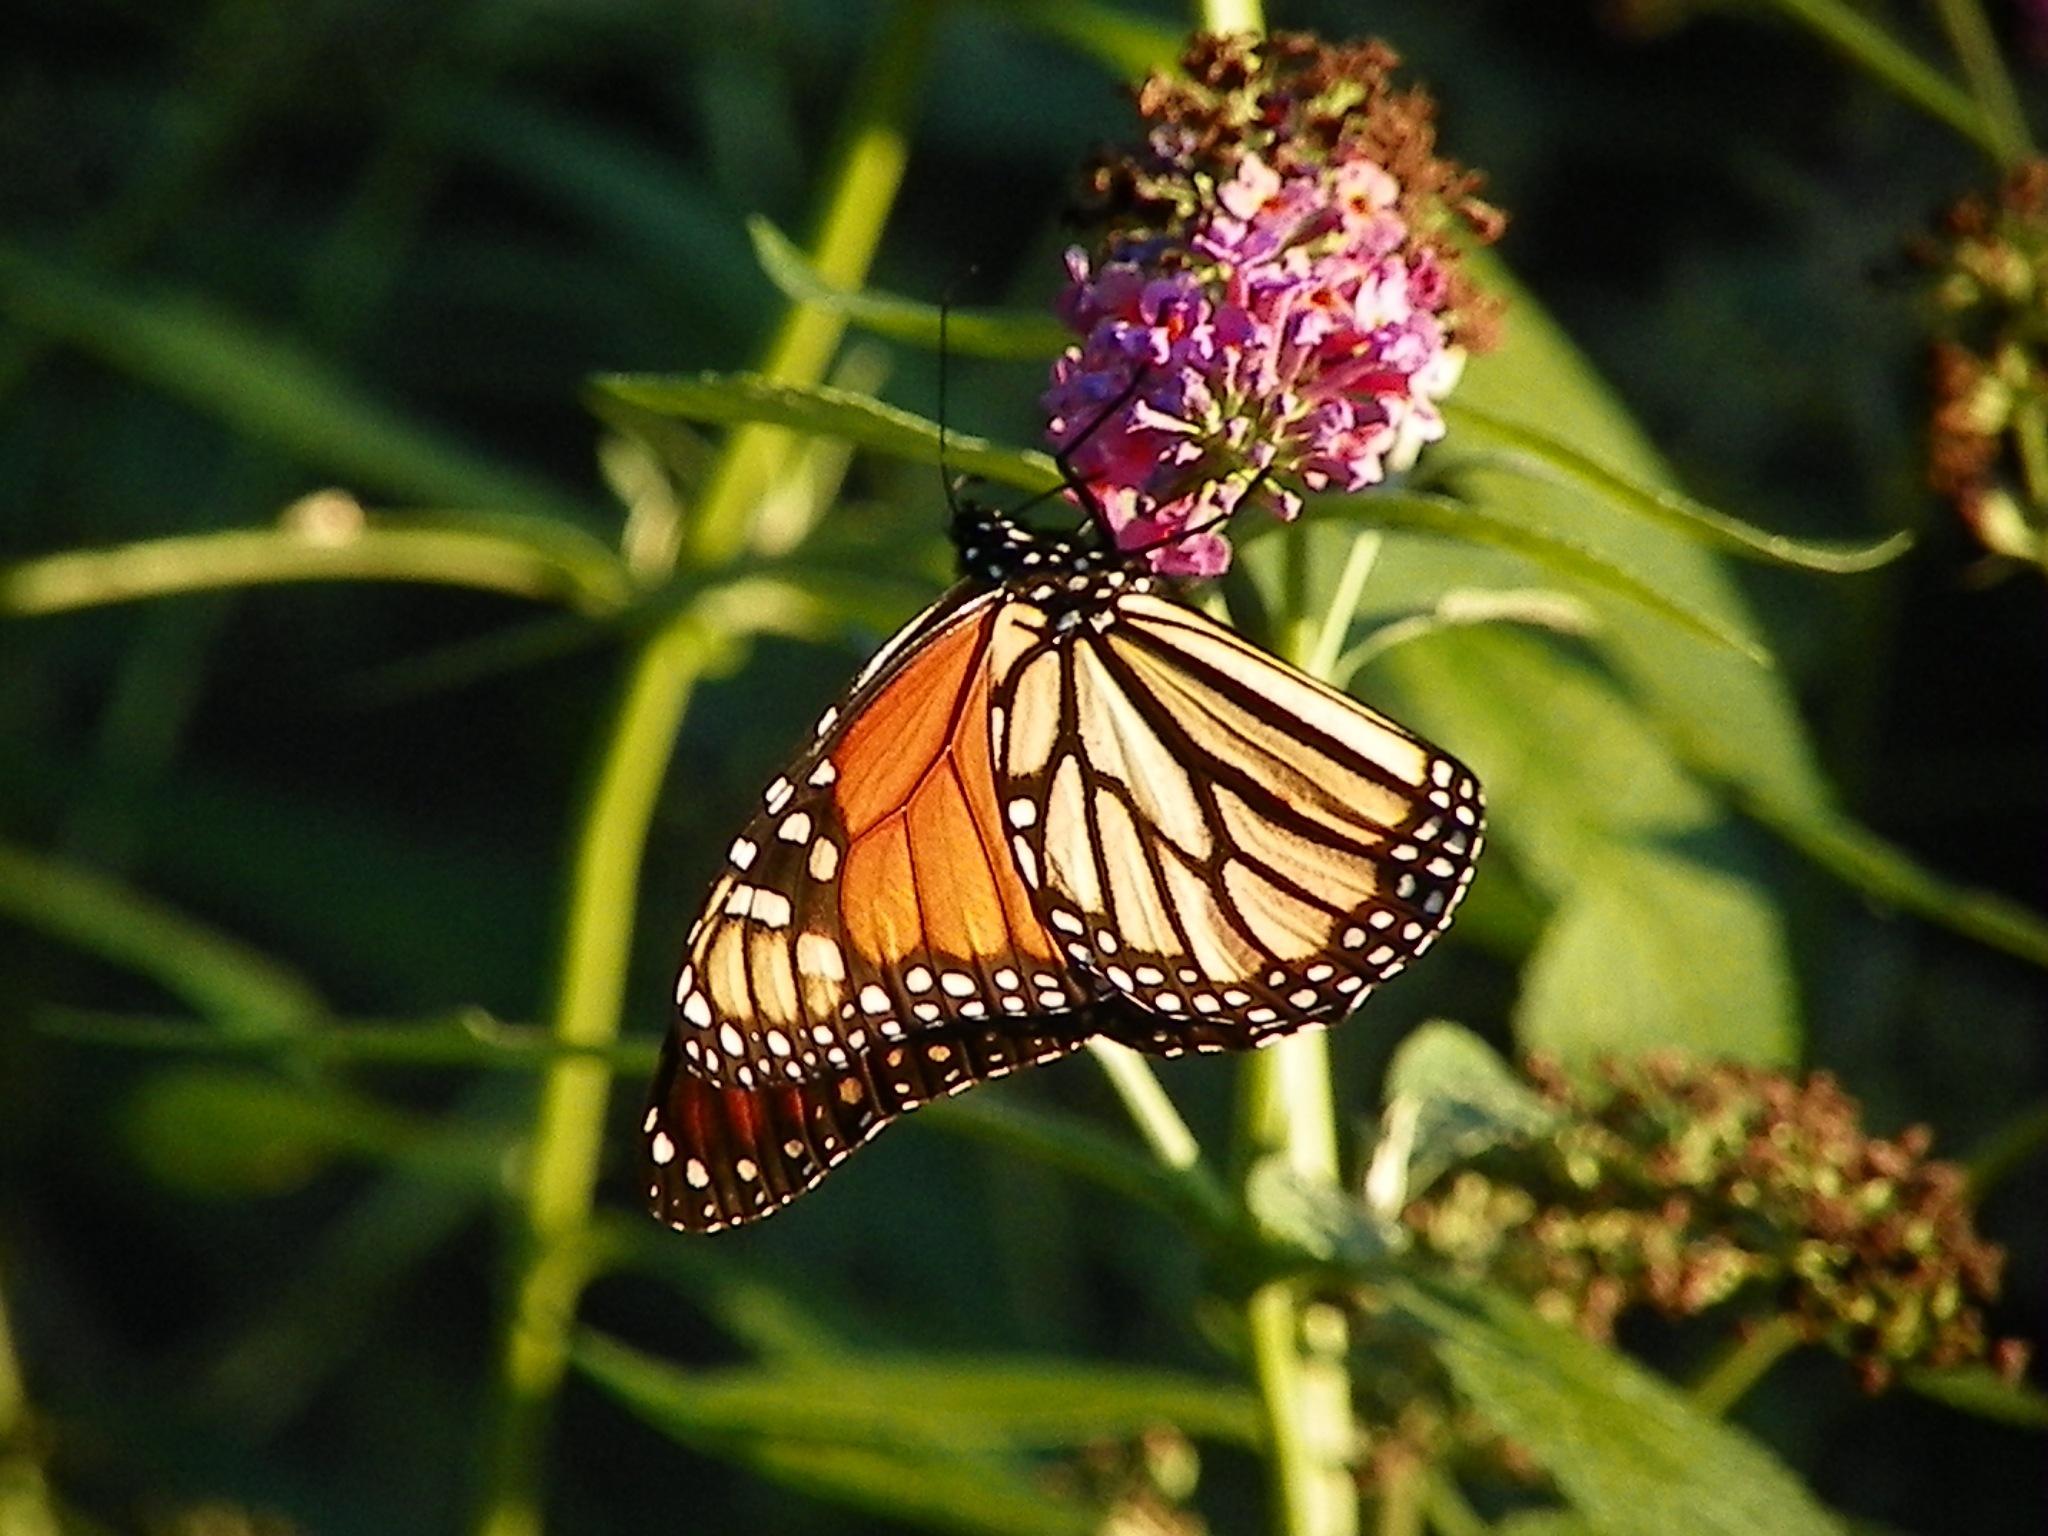 The beauty of a Butterfly by ssmjdd